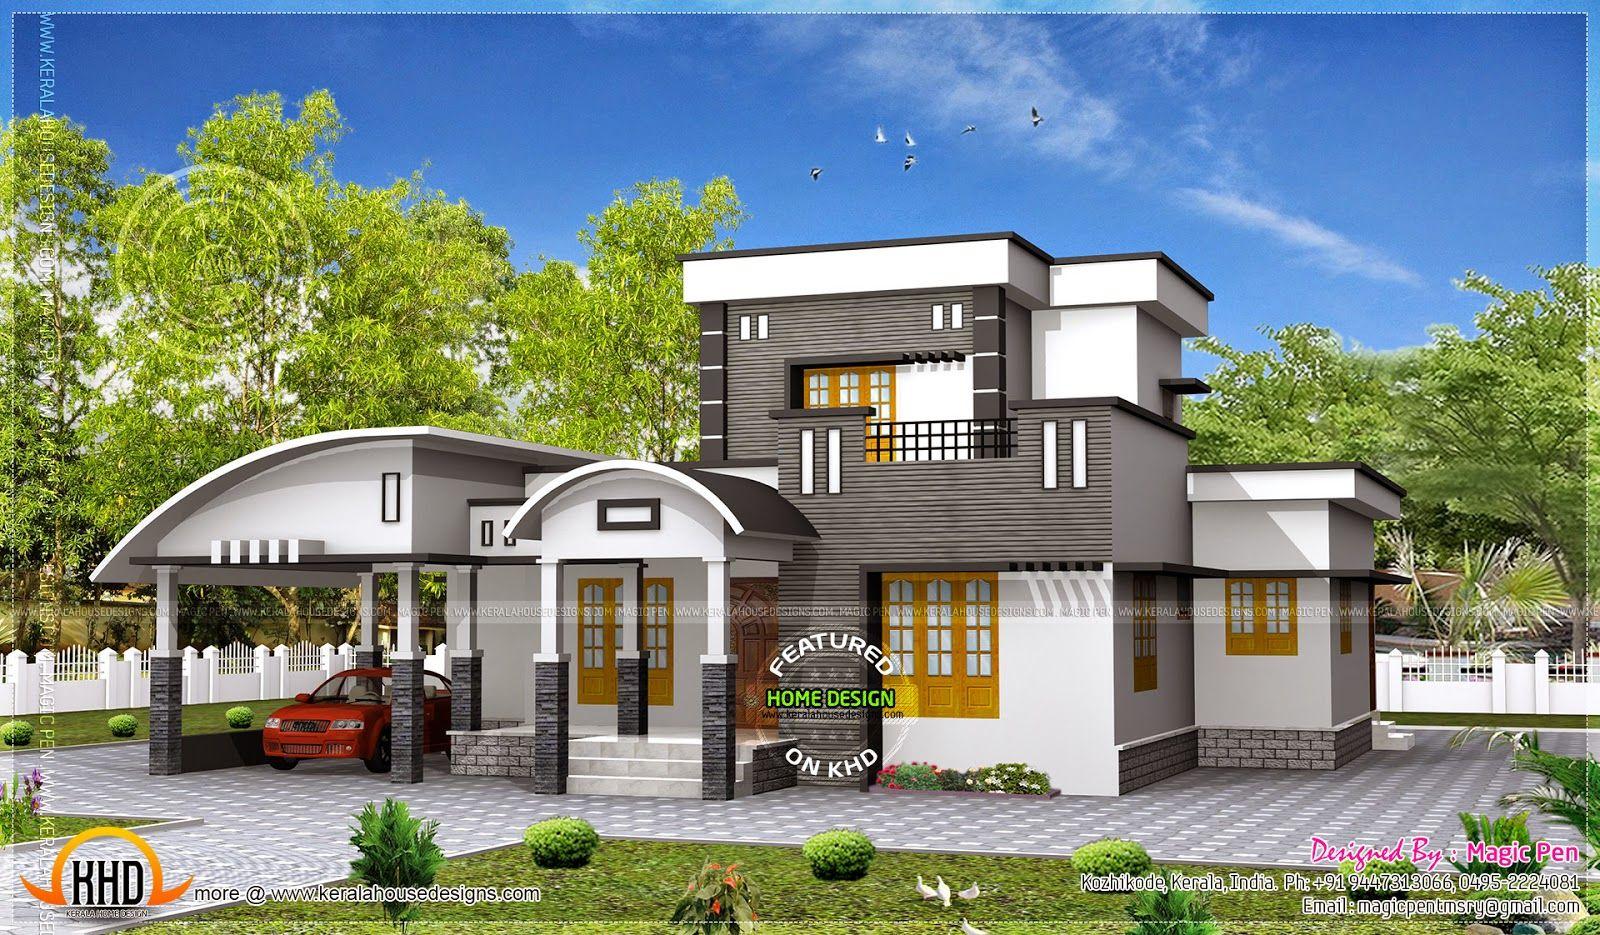 Sq Ft House Plans House Plans Kerala Home Design Kerala Style Single Floor  House Plan Square Meters Sq Ft | Home Design | Pinterest | Kerala, Square  Meter ...